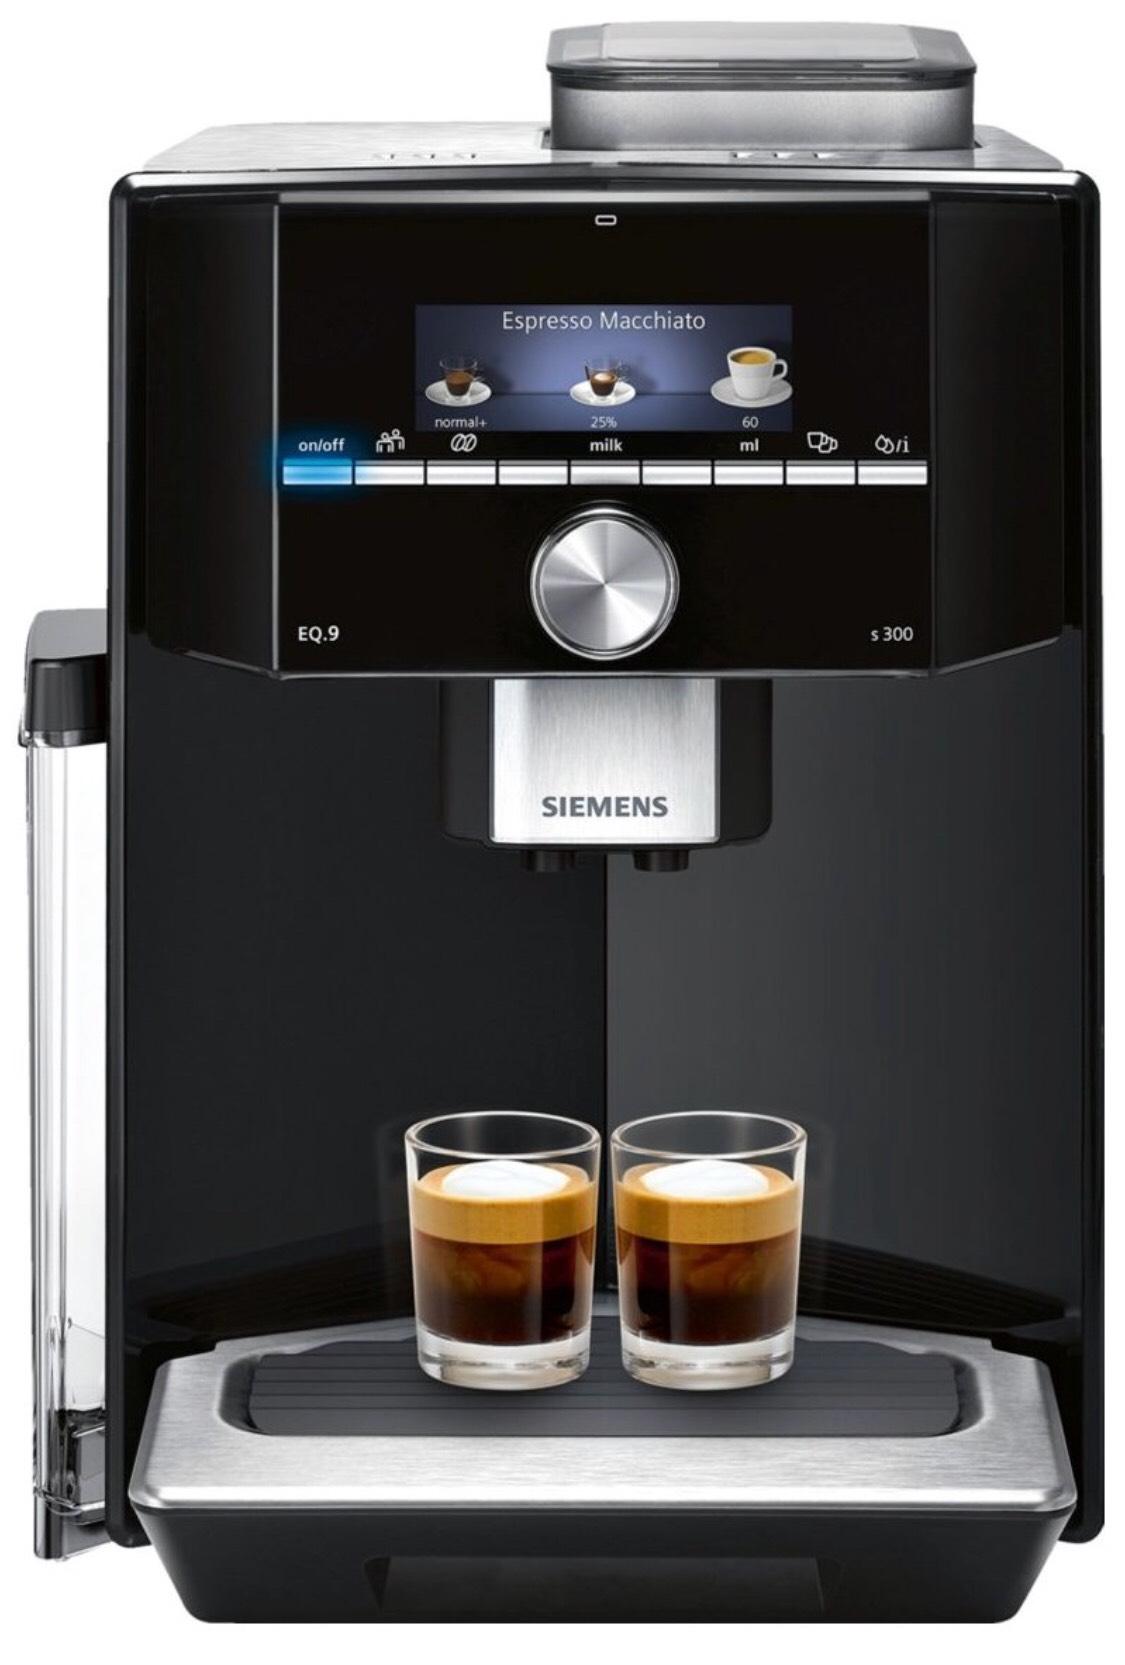 [Lokal Mediamarkt in Oldenburg] Siemens Kaffeevollautomat EQ 9 s300